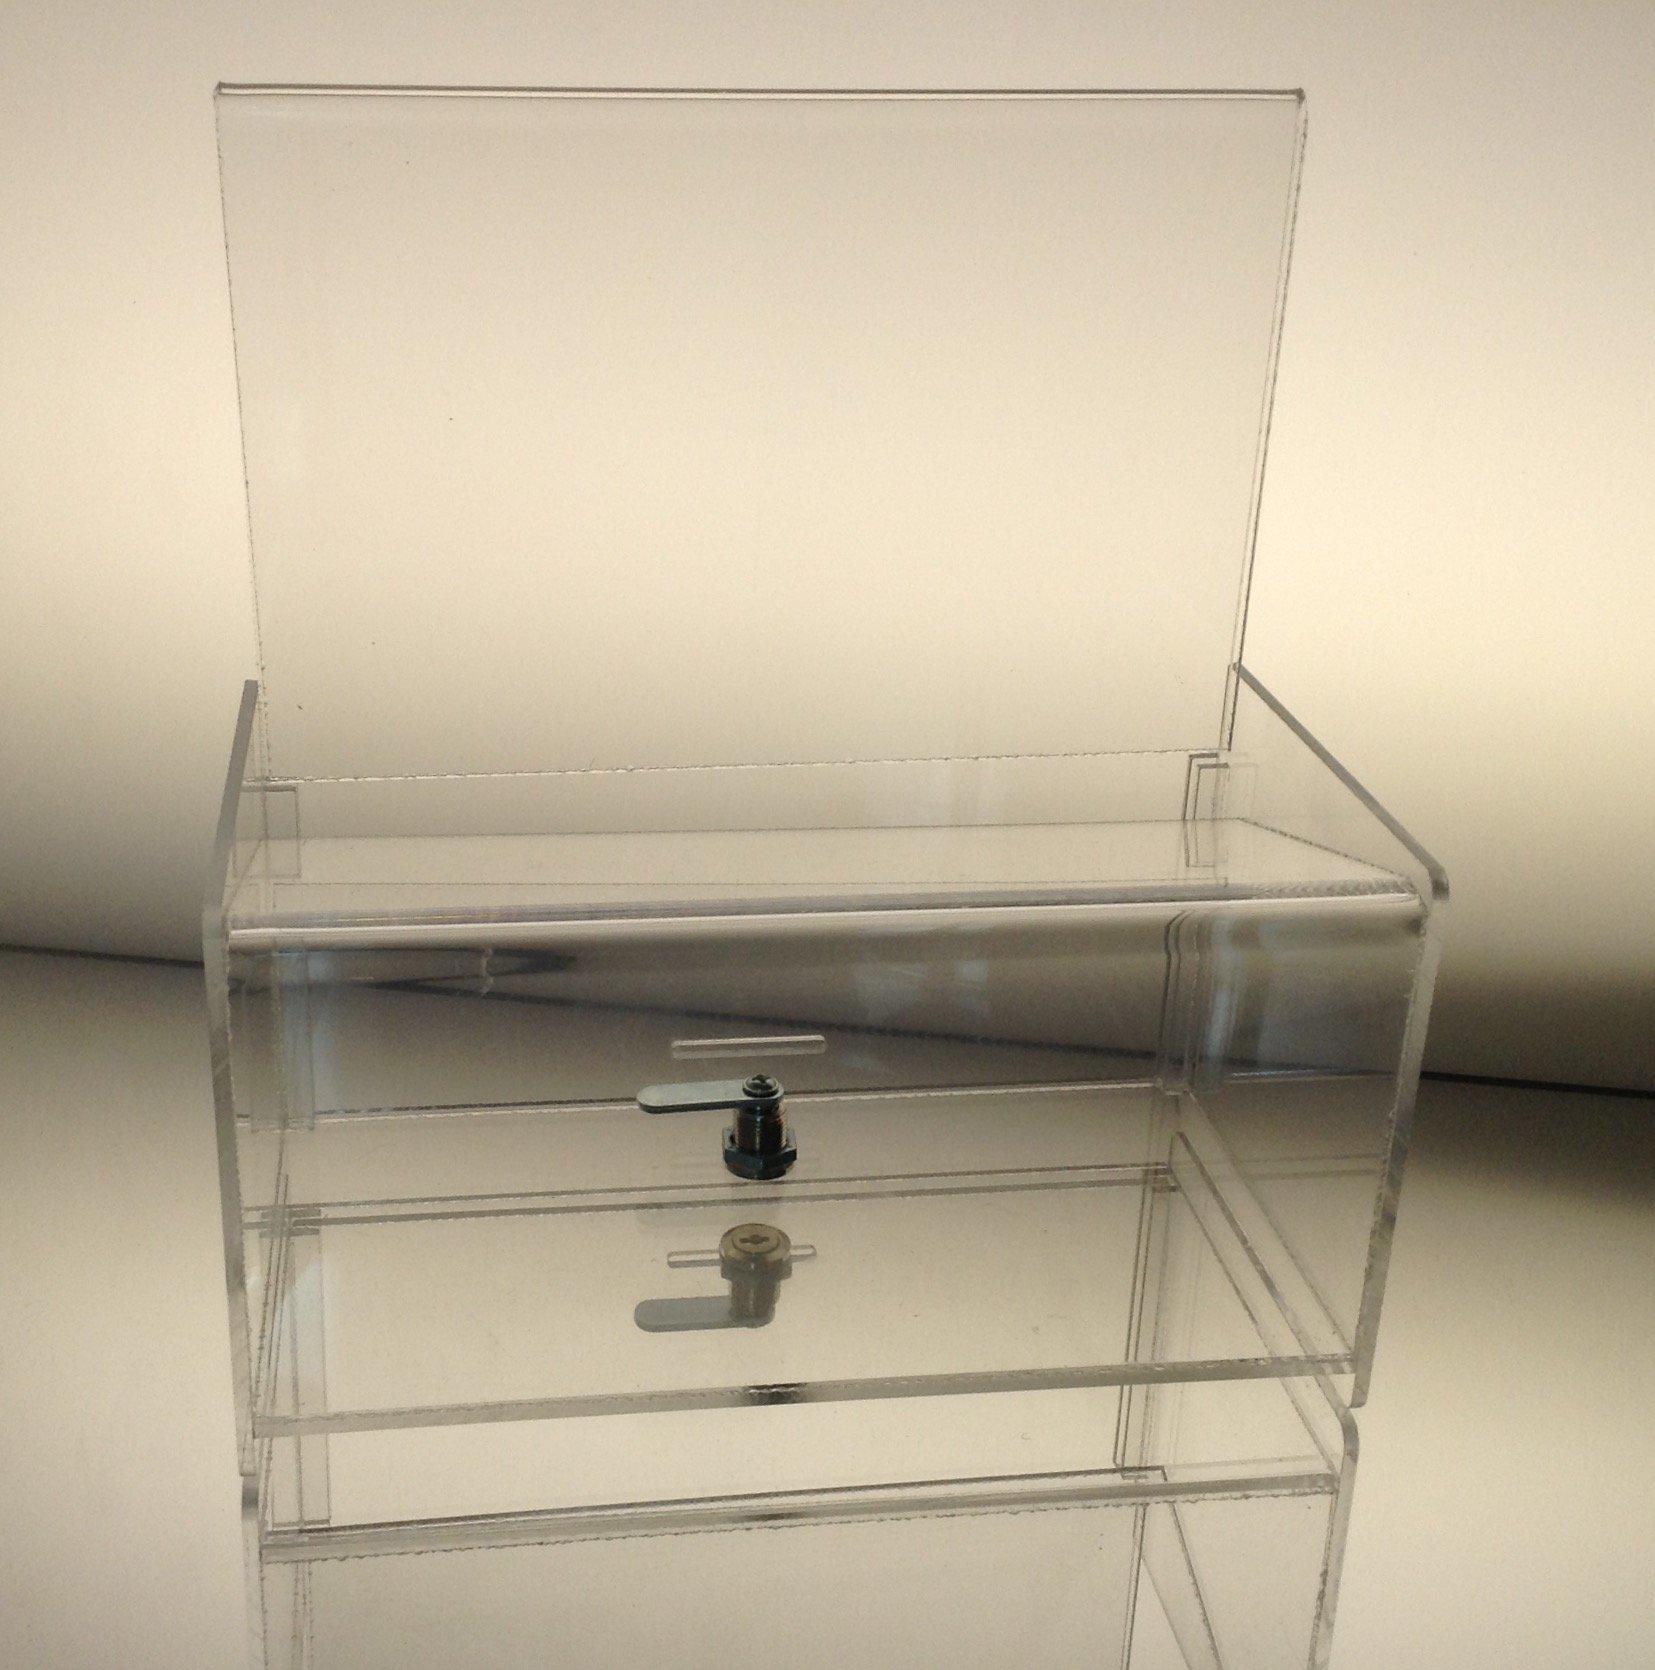 Dazzling Displays Clear Acrylic Easy Drop Donation Box